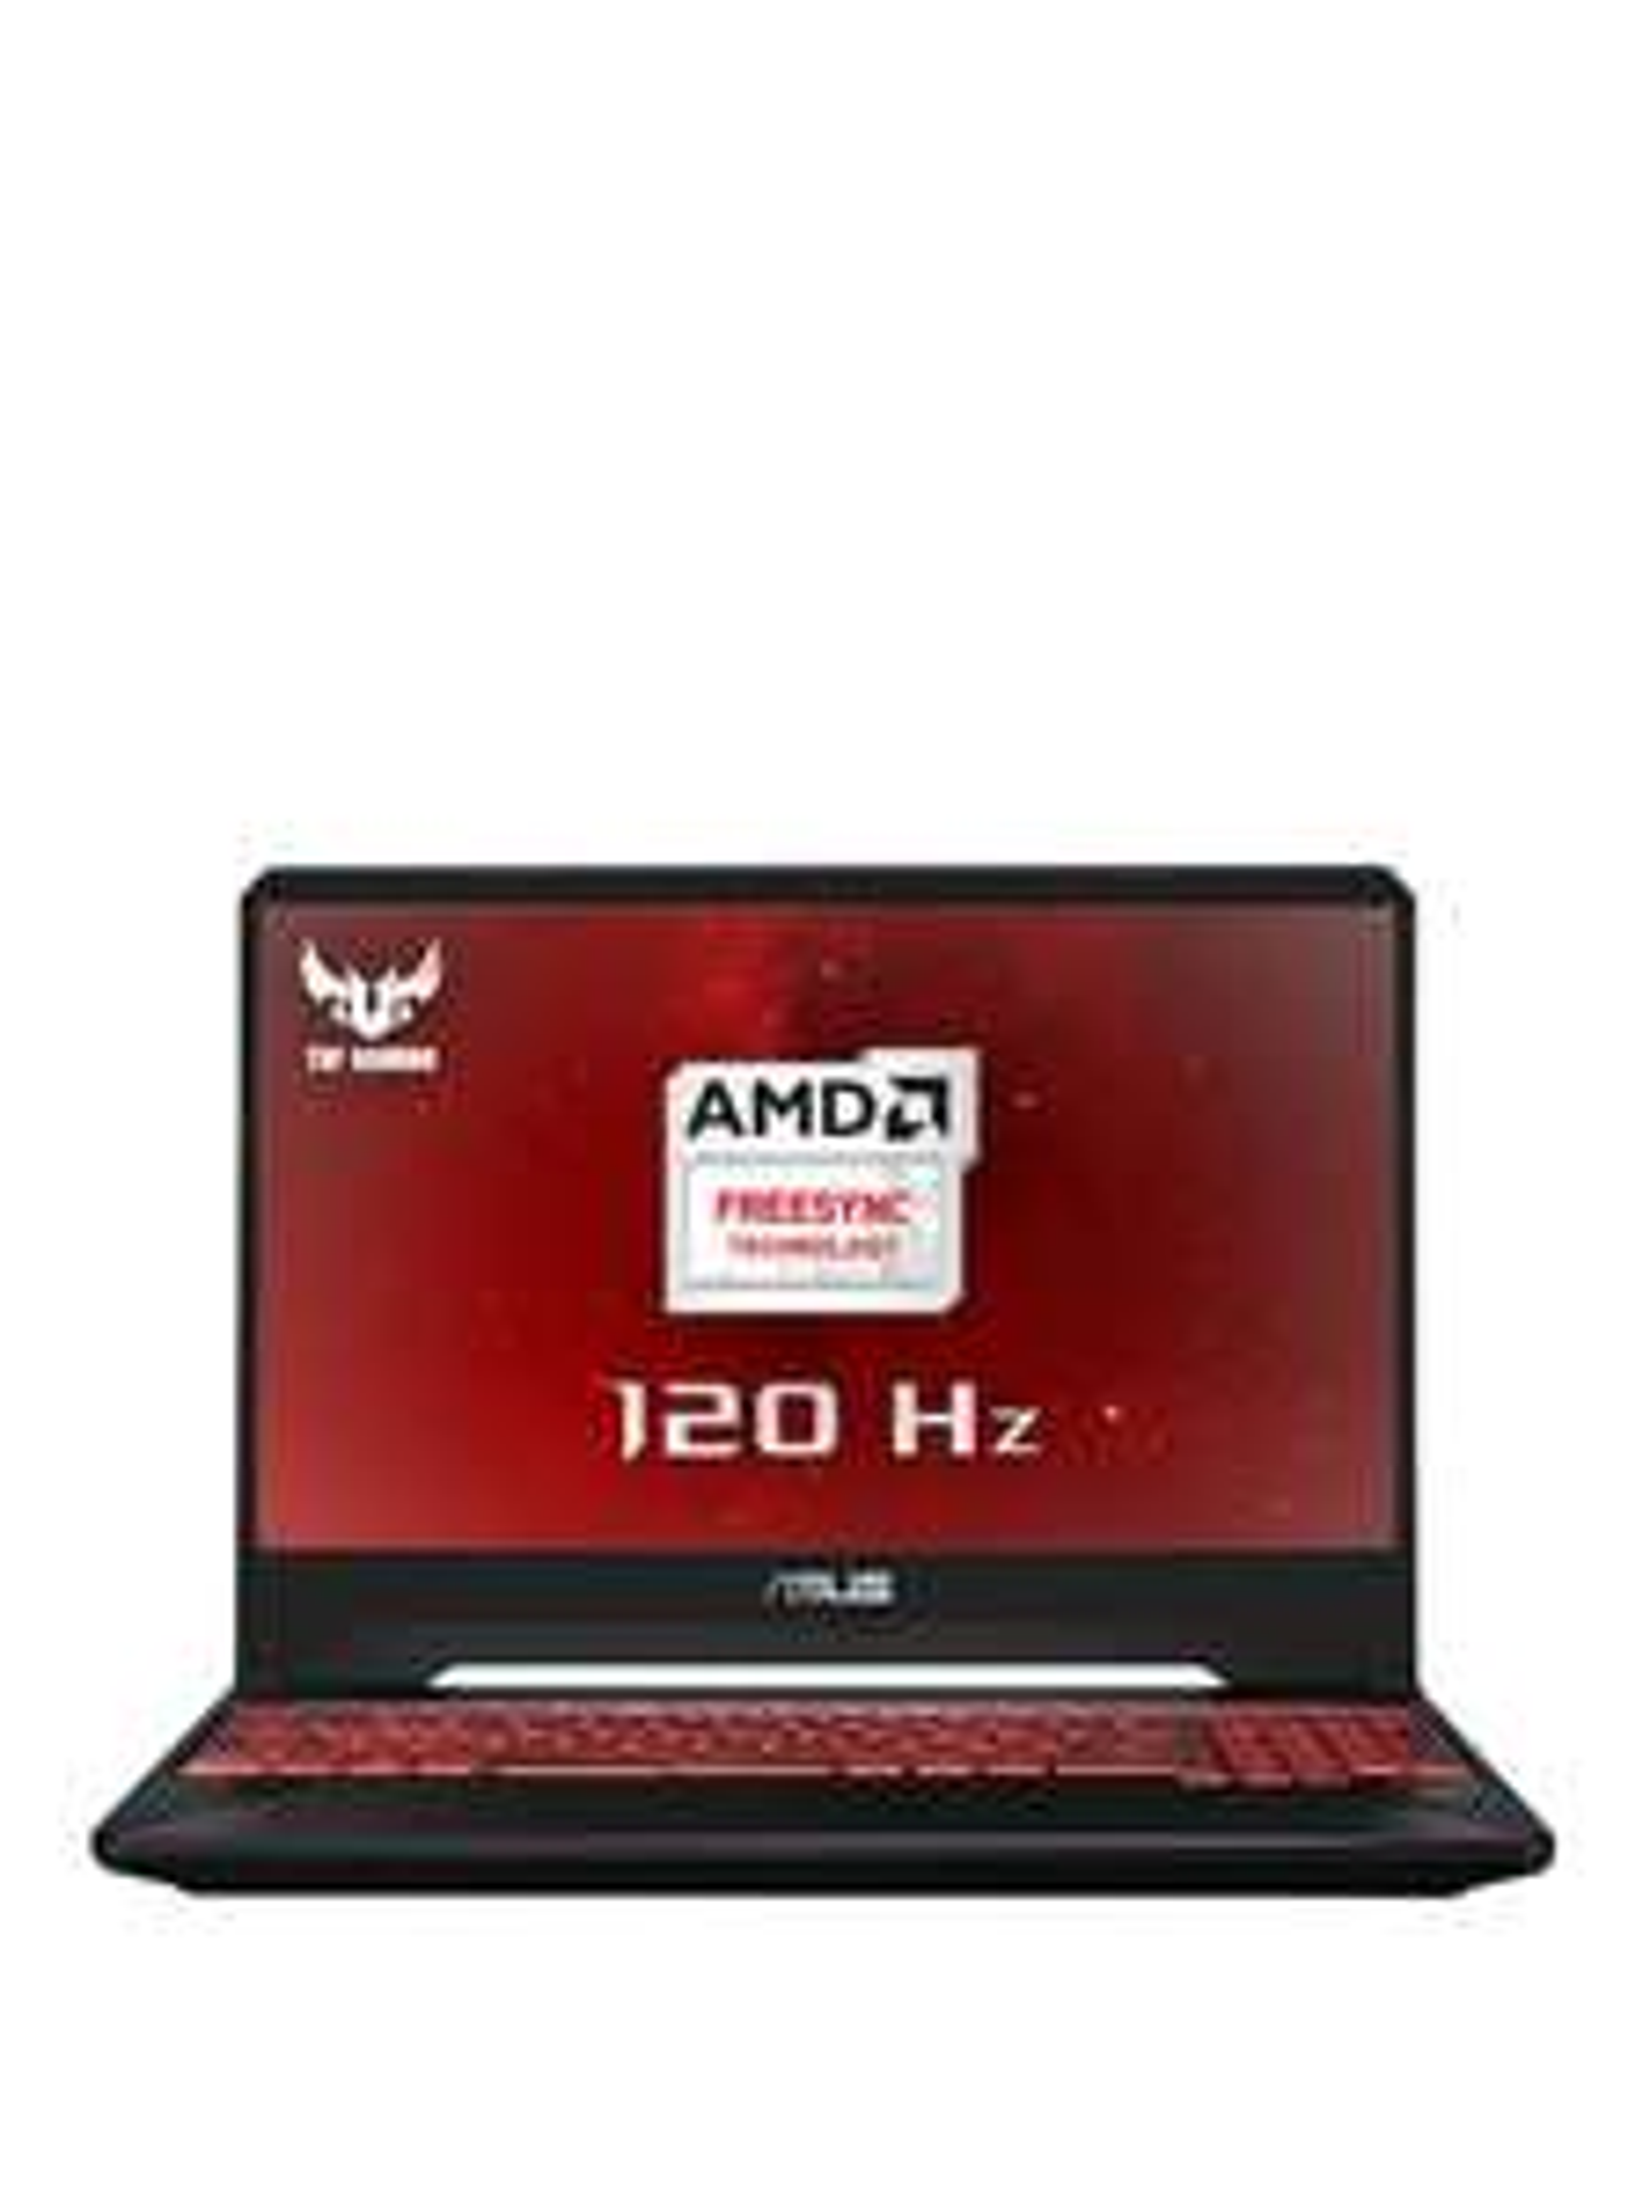 ASUS TUF Gaming FX505DY-AL006T AMD Ryzen 5 8GB RAM 1TB54R + 256GB PCIE SSD 15.6in 120Hz PC Gaming Laptop - £519.99 using code @ Very